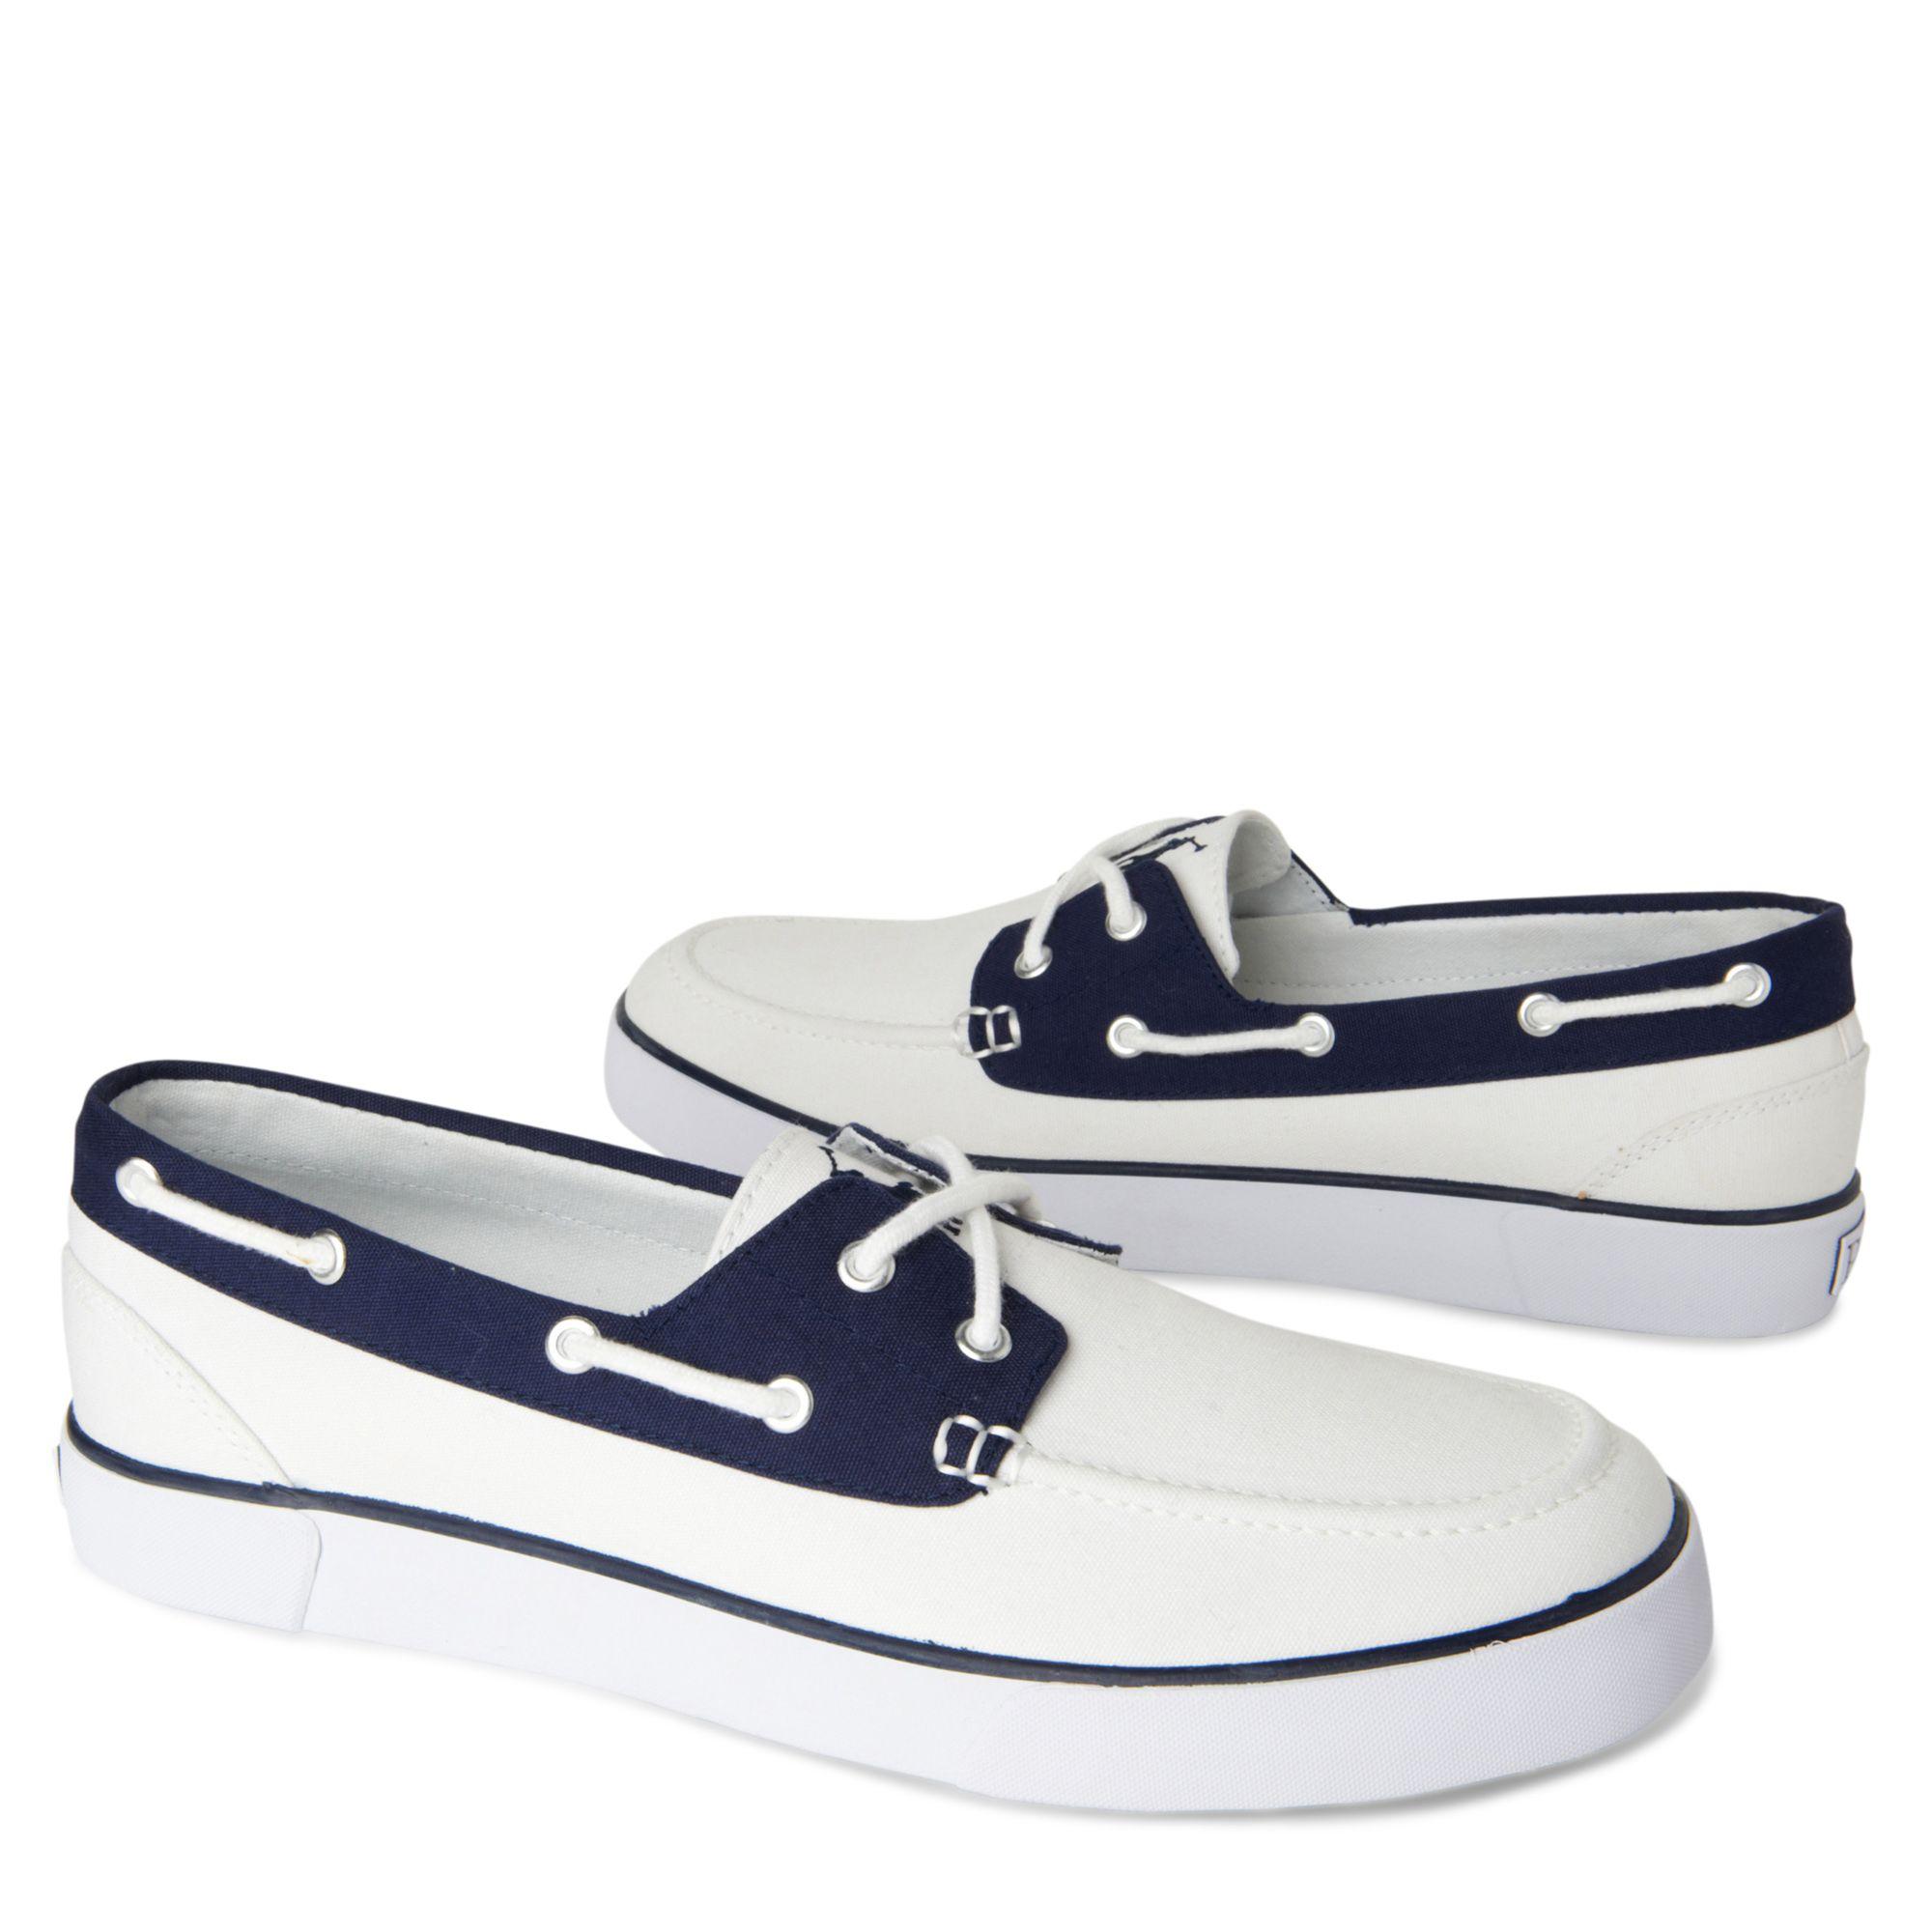 Ralph Lauren Boat Shoes White